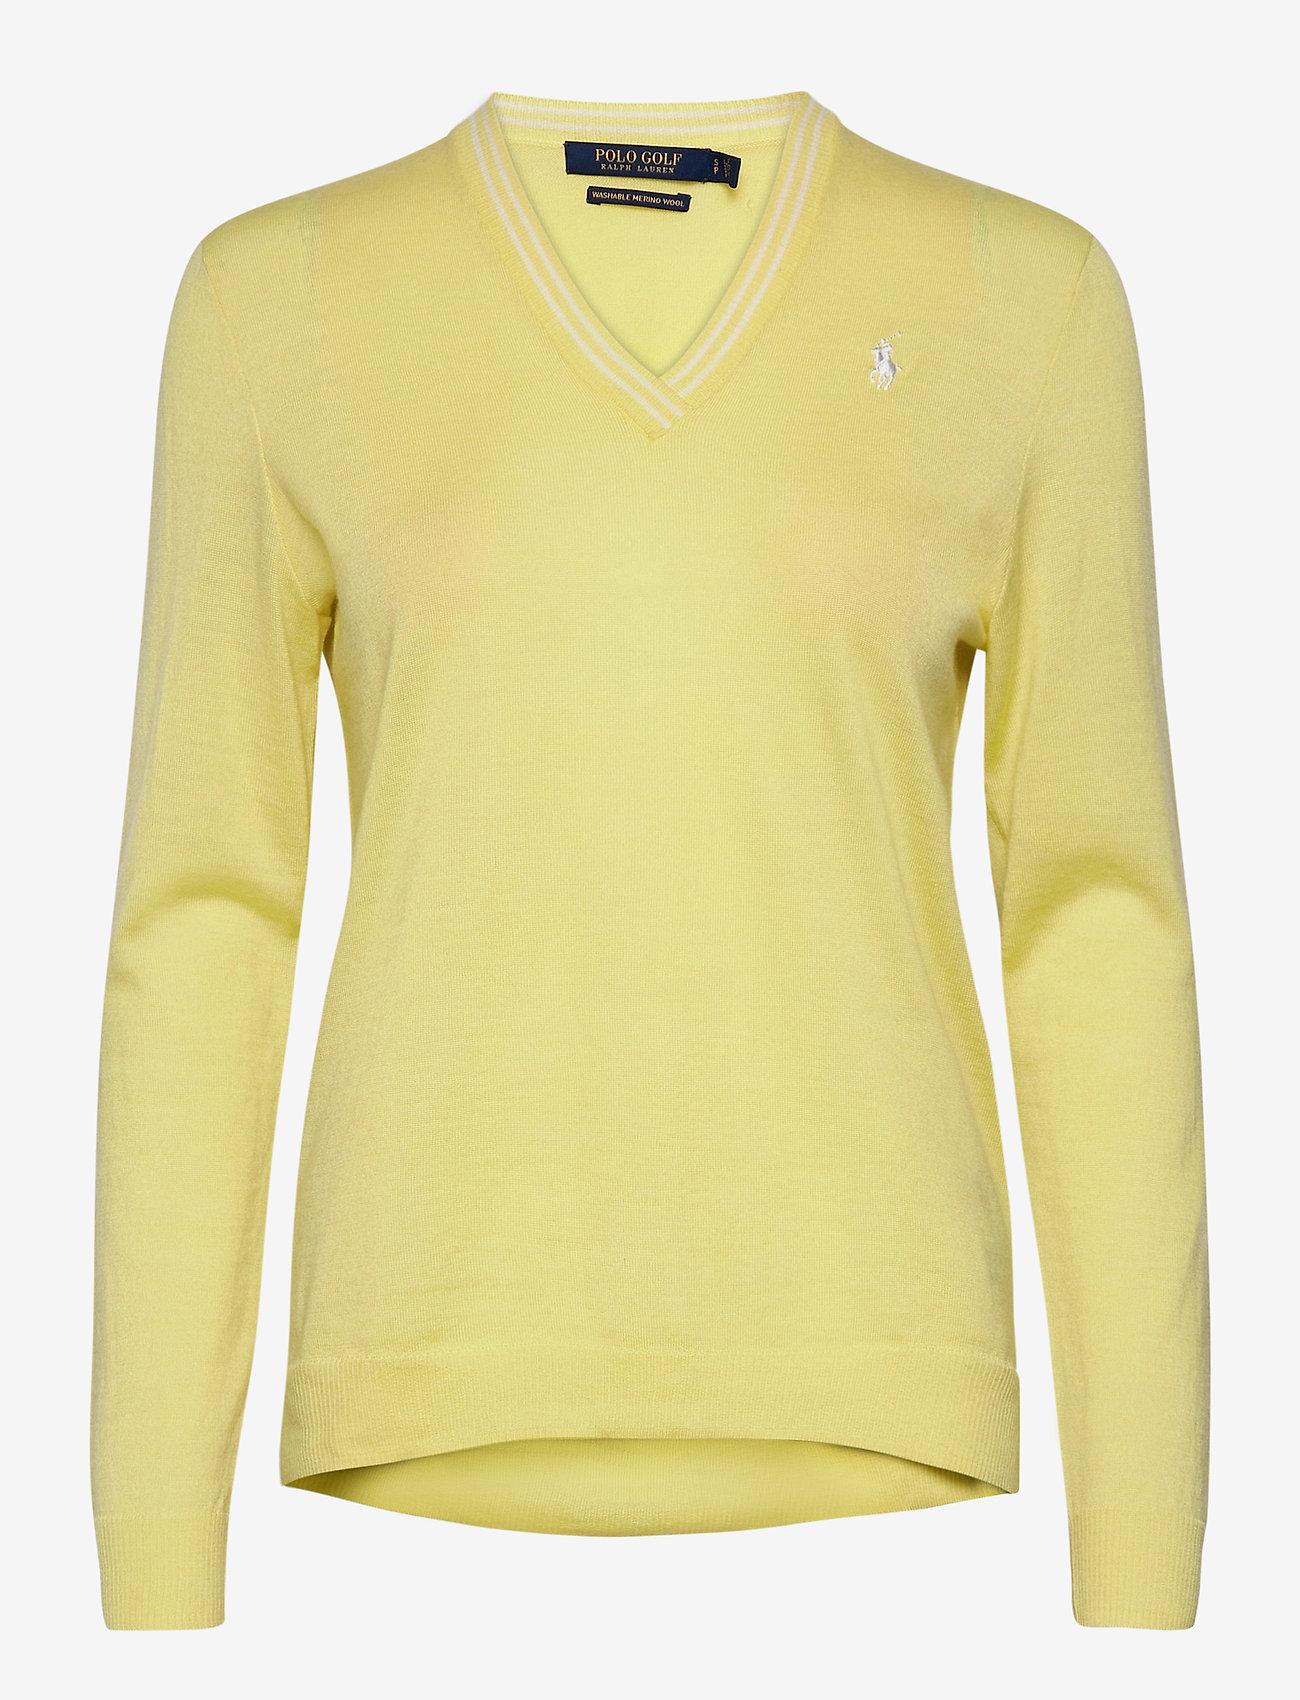 Ralph Lauren Golf - Merino Wool V-Neck Golf Sweater - gebreid - bristol yellow/pure white - 0